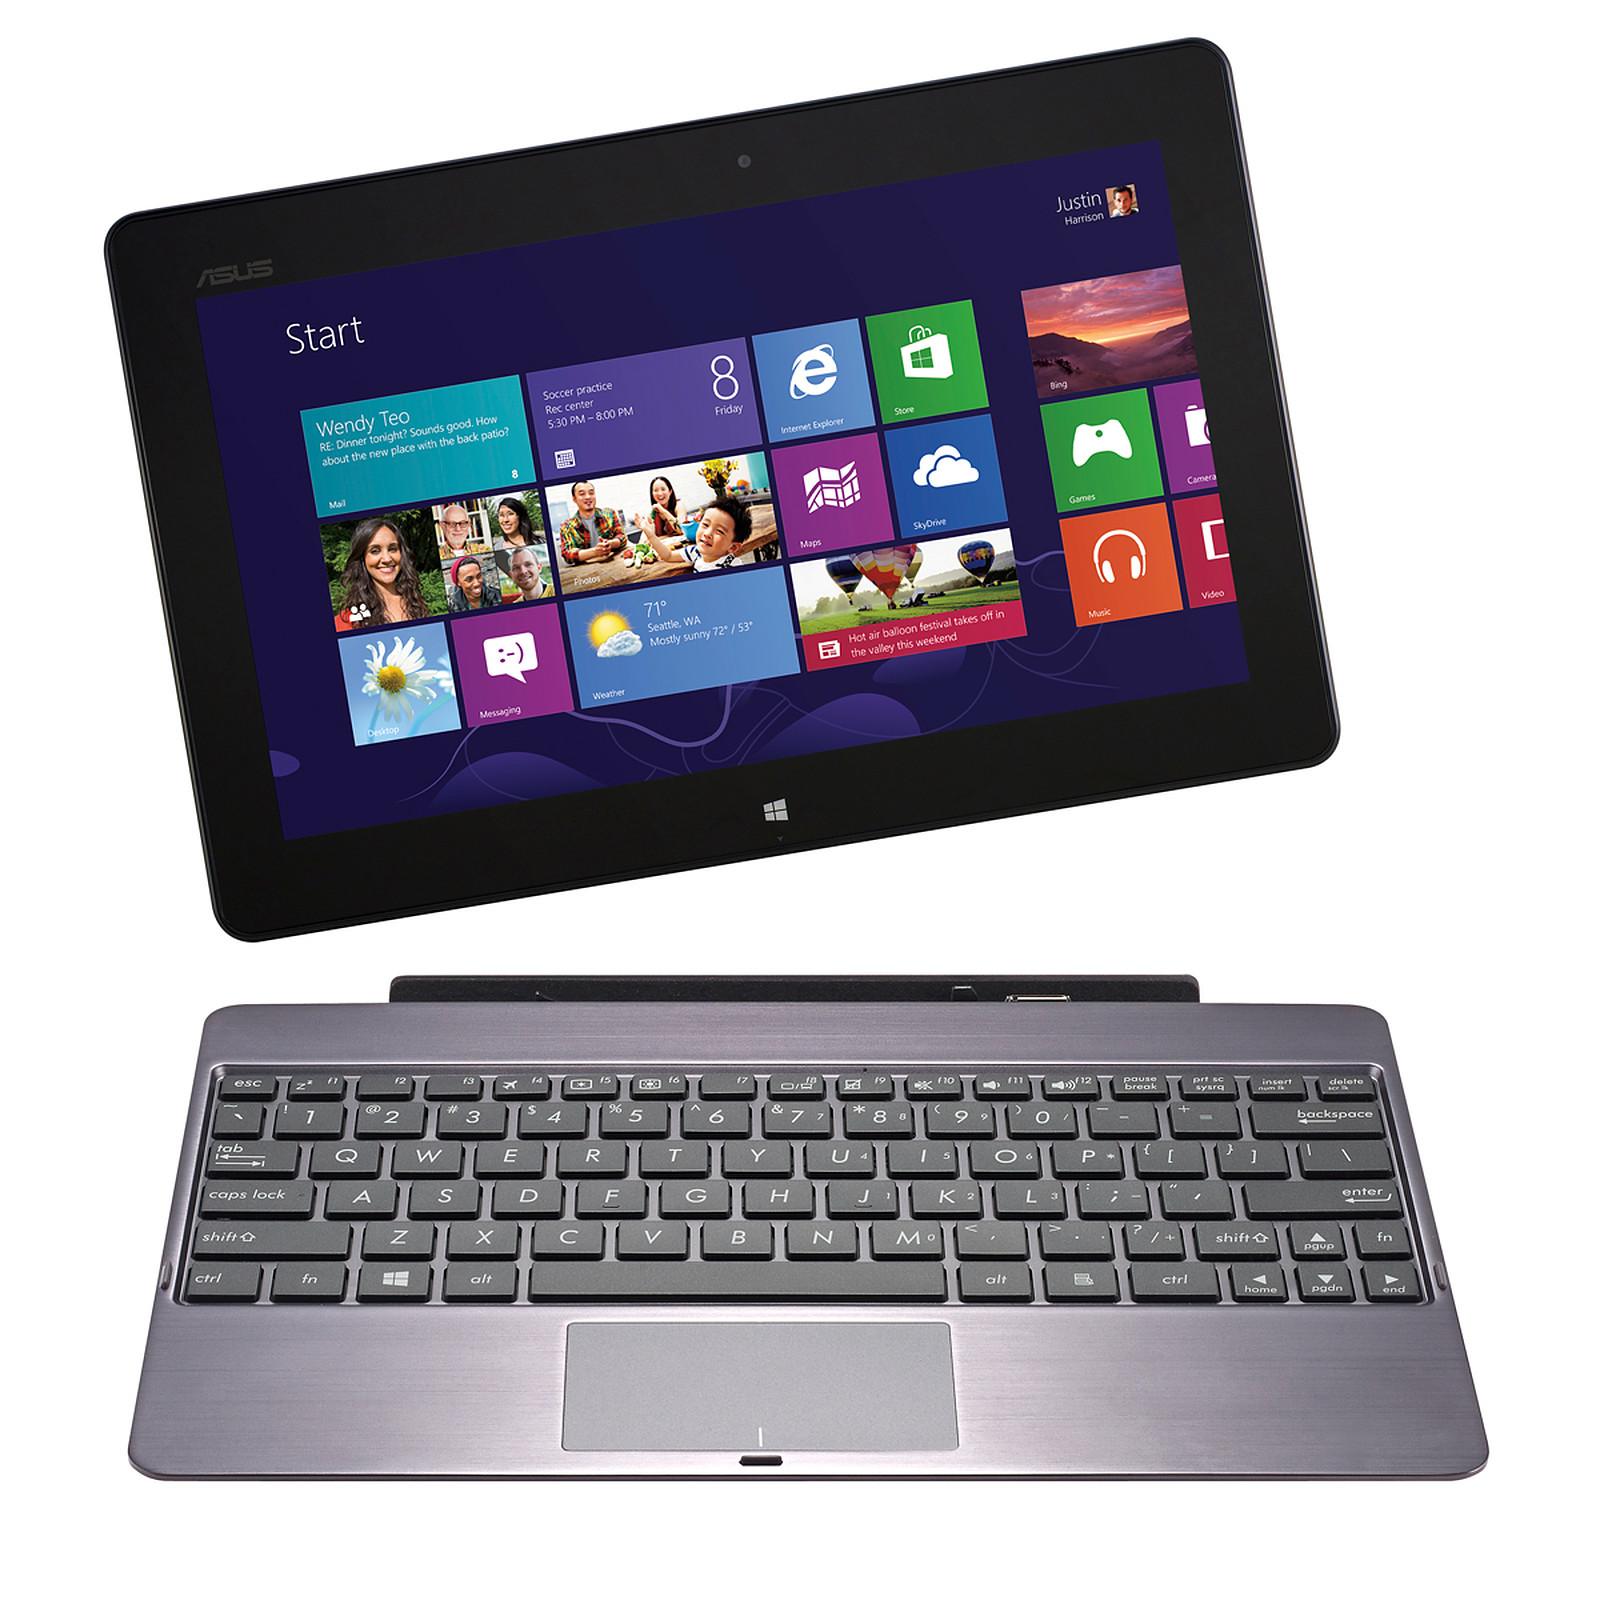 ASUS Vivo Tab RT TF600T-1B082R - Tablette tactile ASUS sur